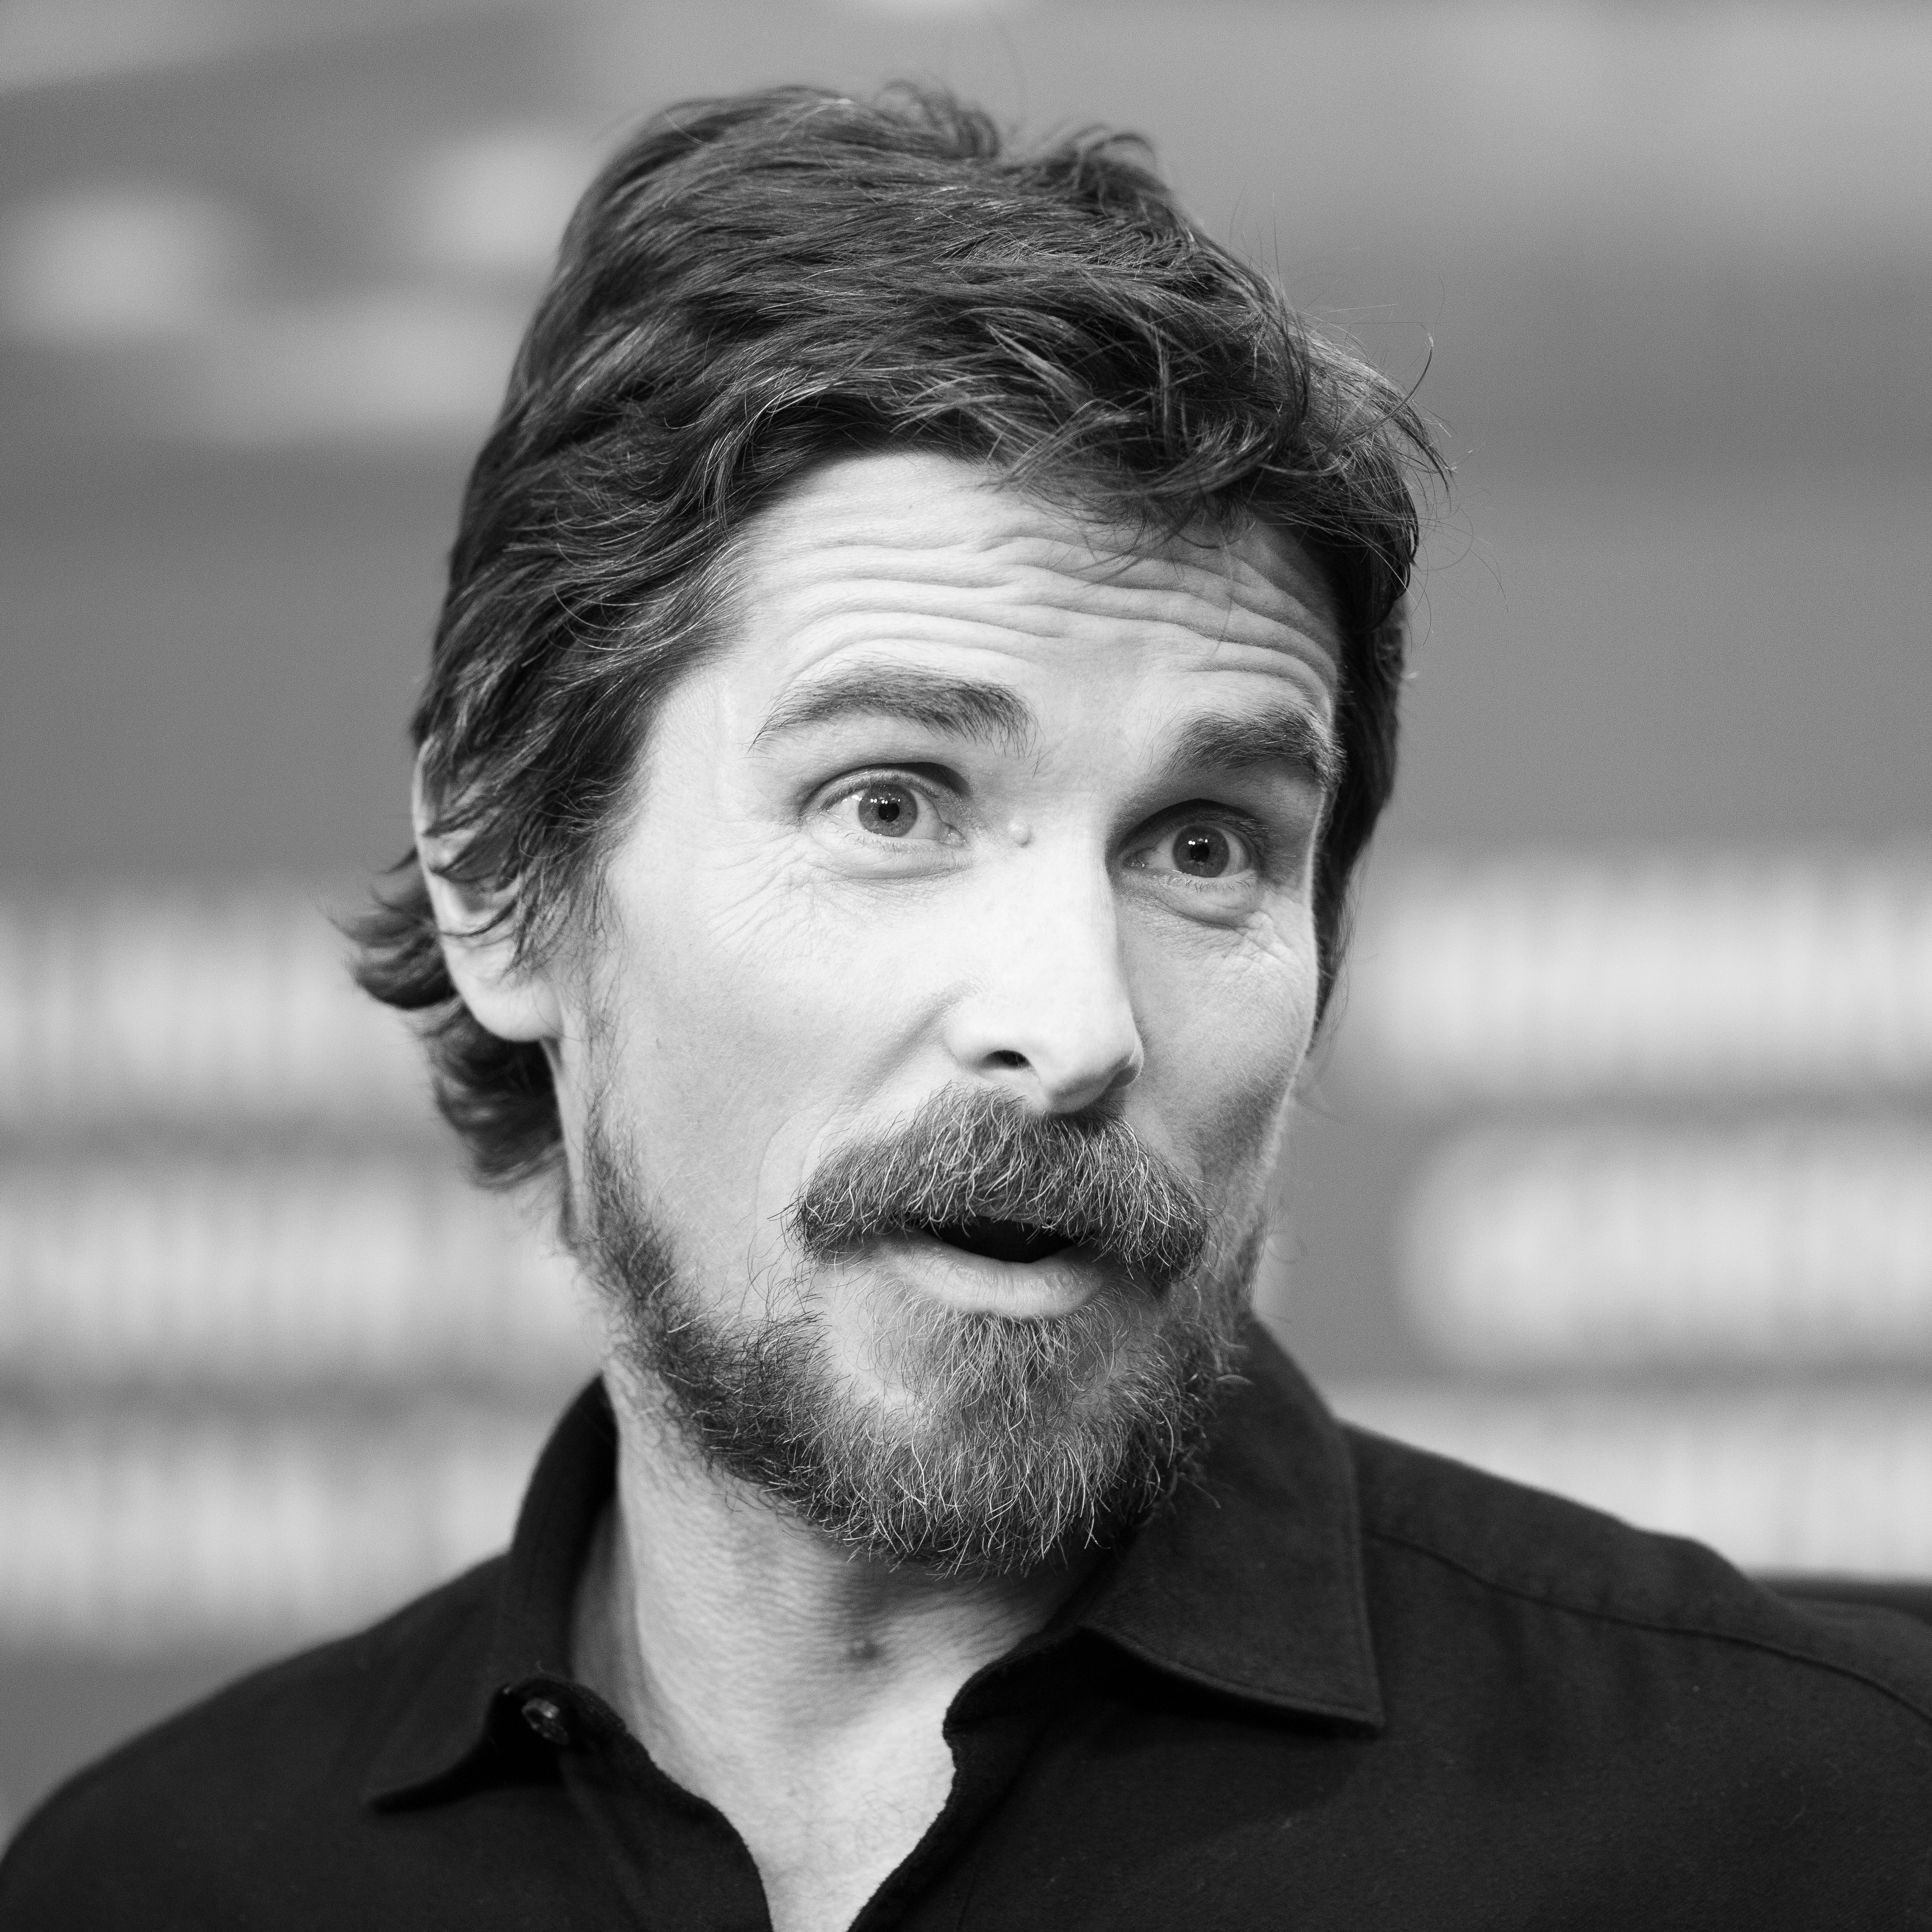 Christian Bale photo #111405, Christian Bale image